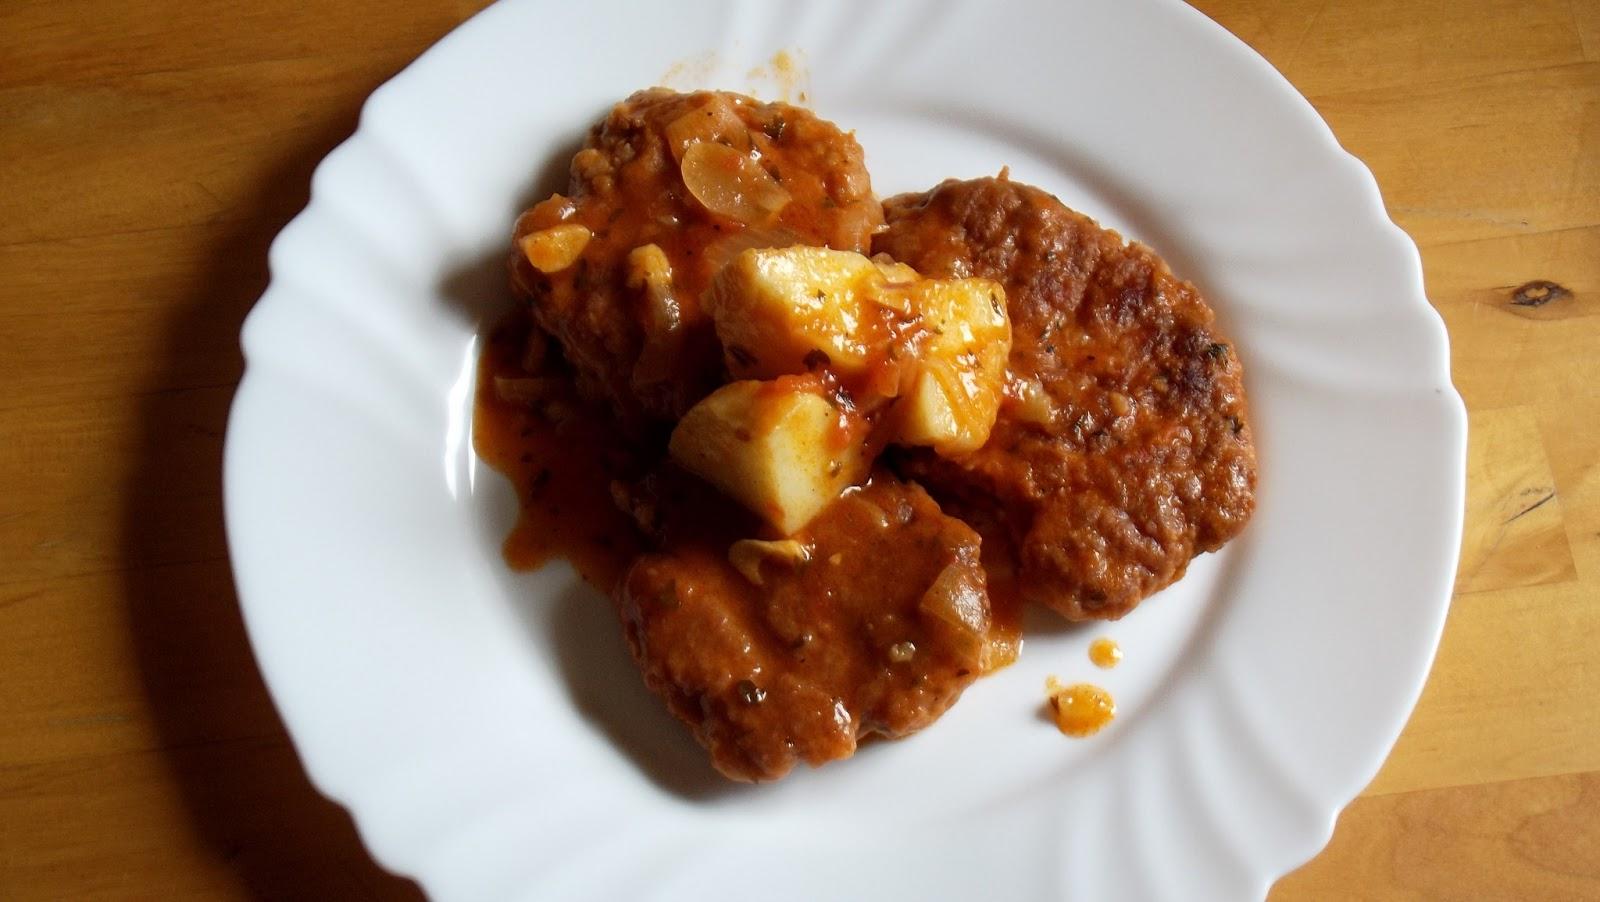 Filetes rusos en salsa de tomate hoy cocina la erika - Filetes de carne en salsa ...